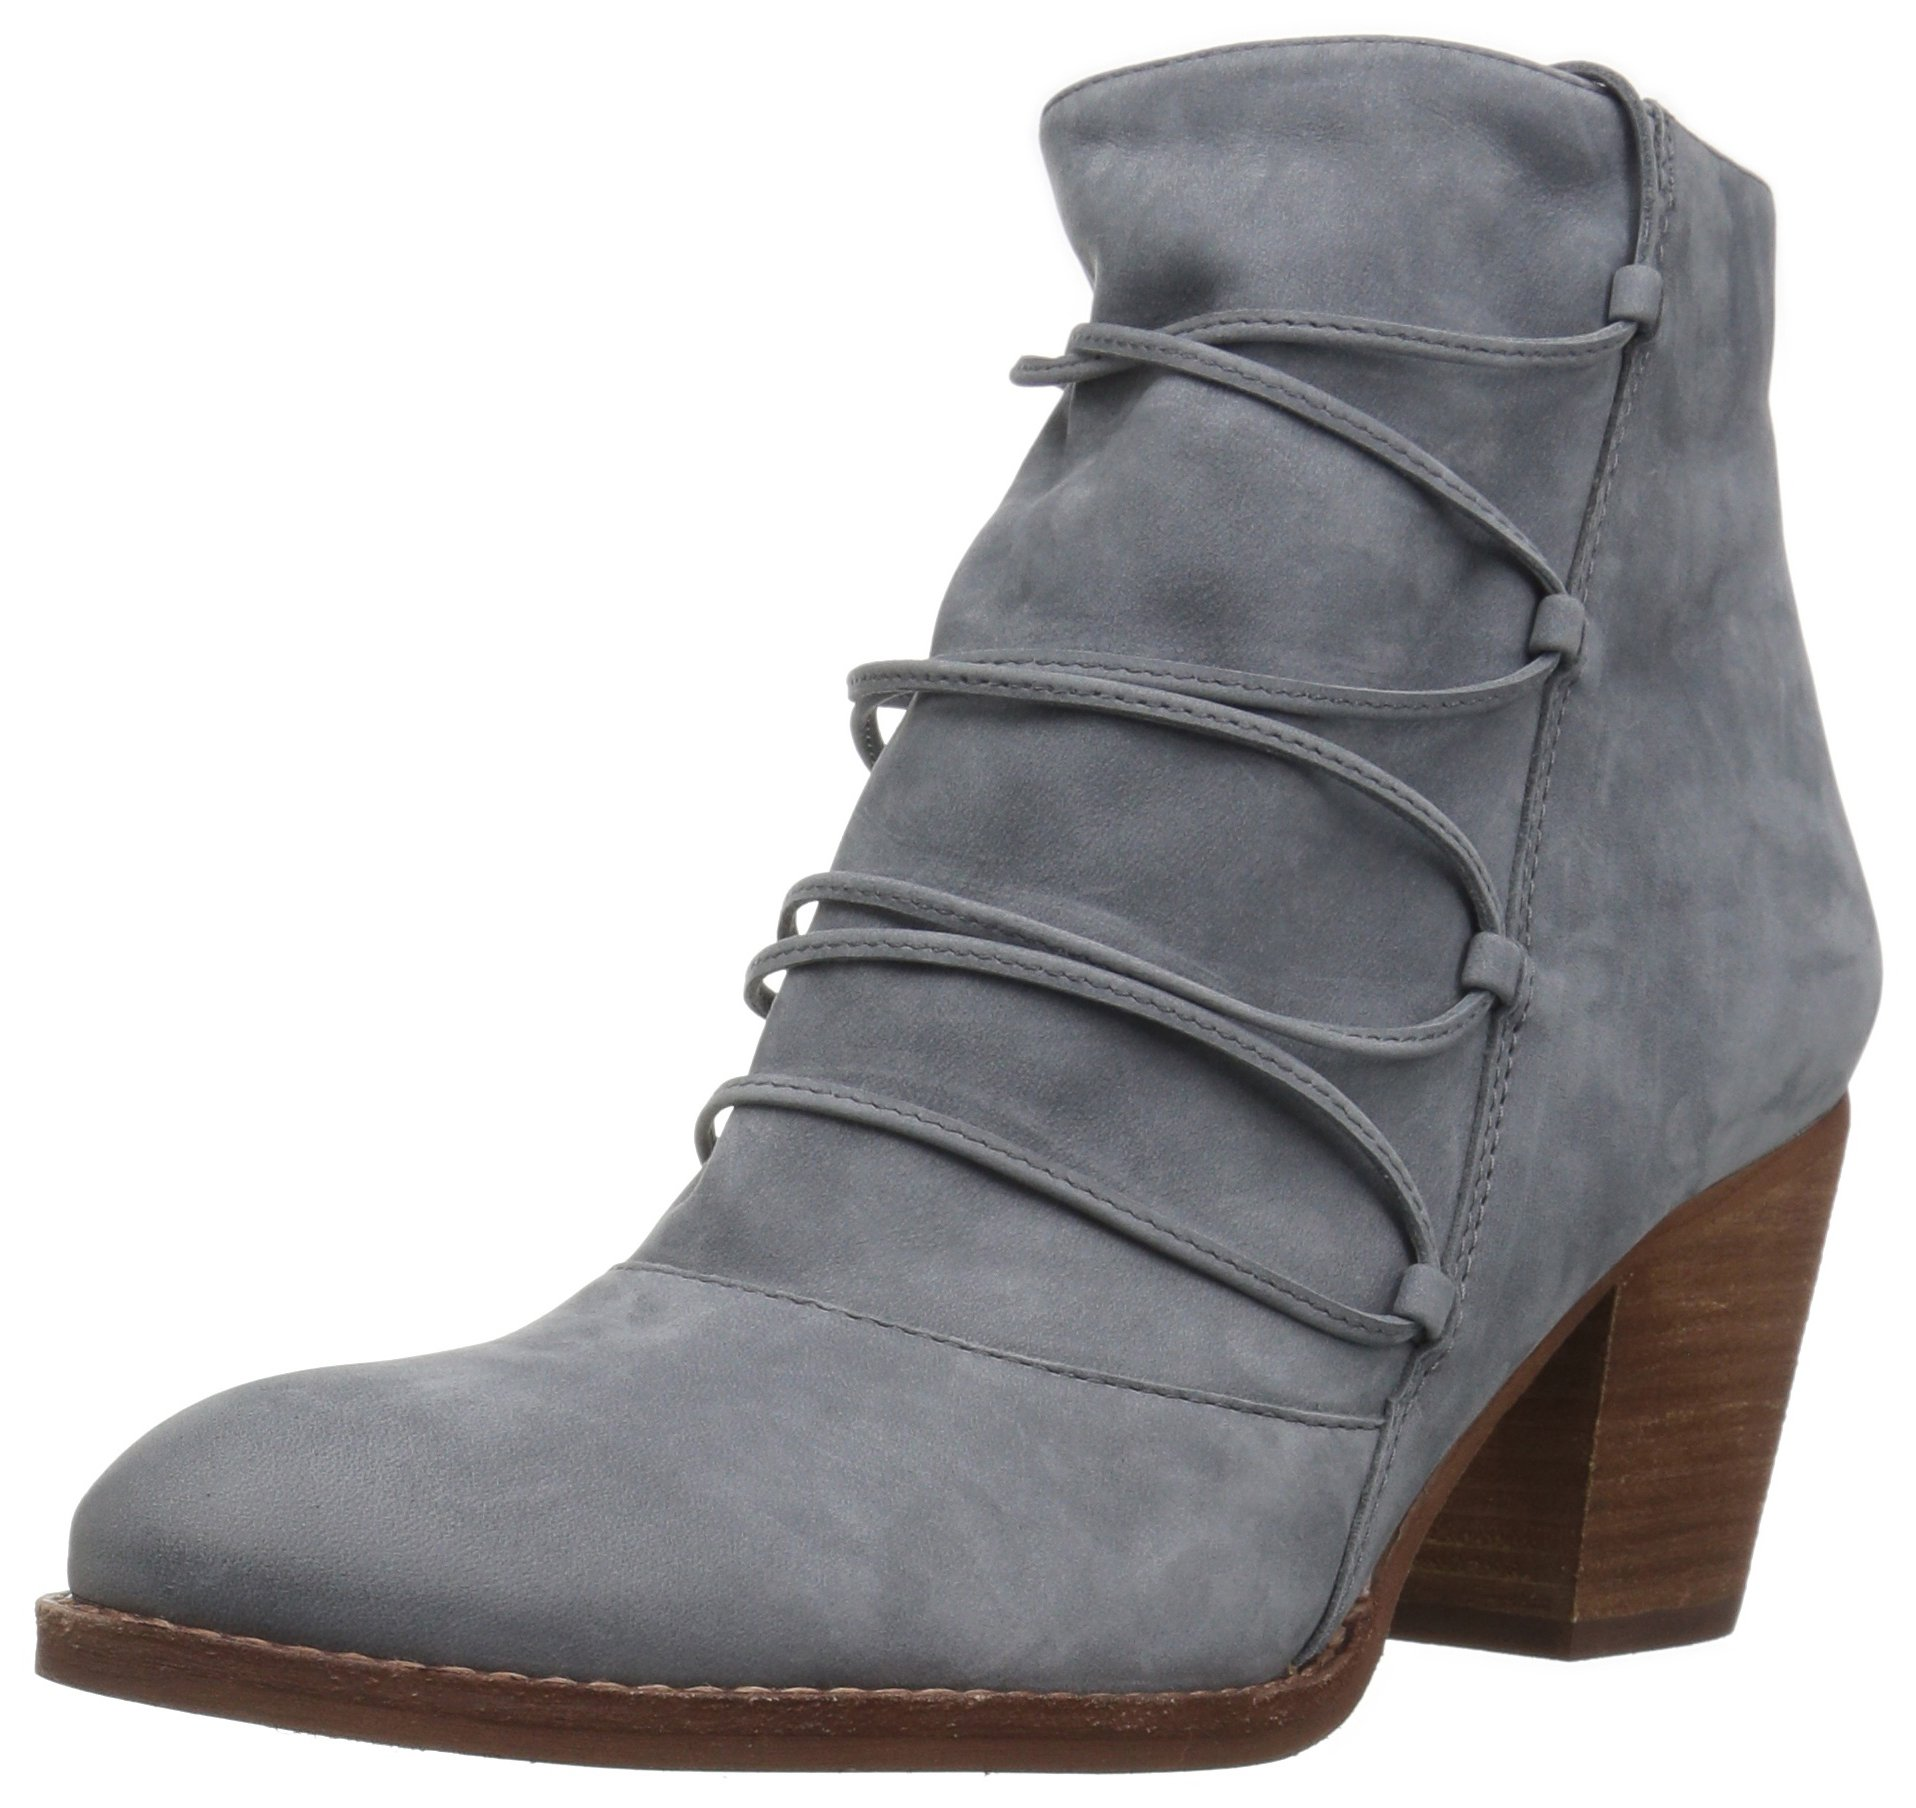 Sam Edelman Women's Millard Ankle Boot, Stone Blue Leather, 6.5 Medium US by Sam Edelman (Image #1)